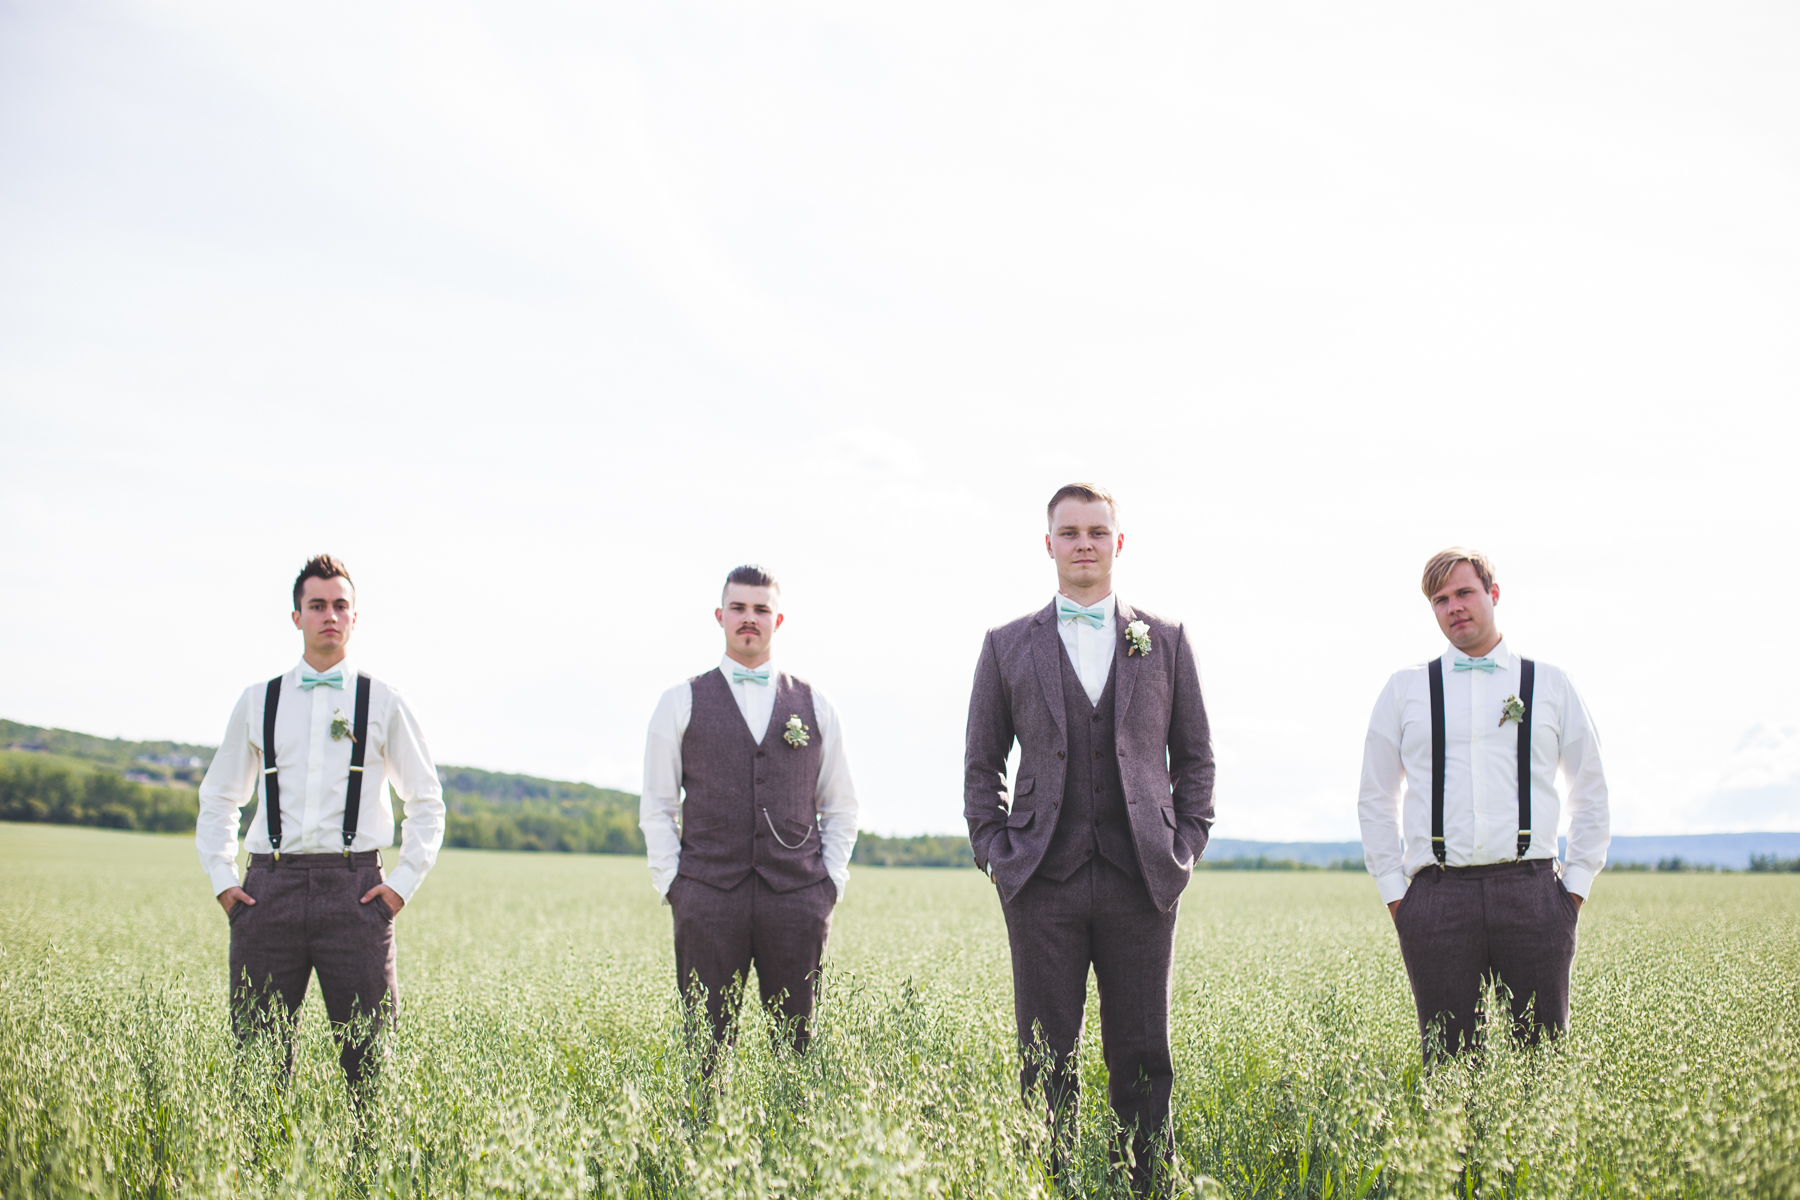 20150808-oglovewedding-750.jpg